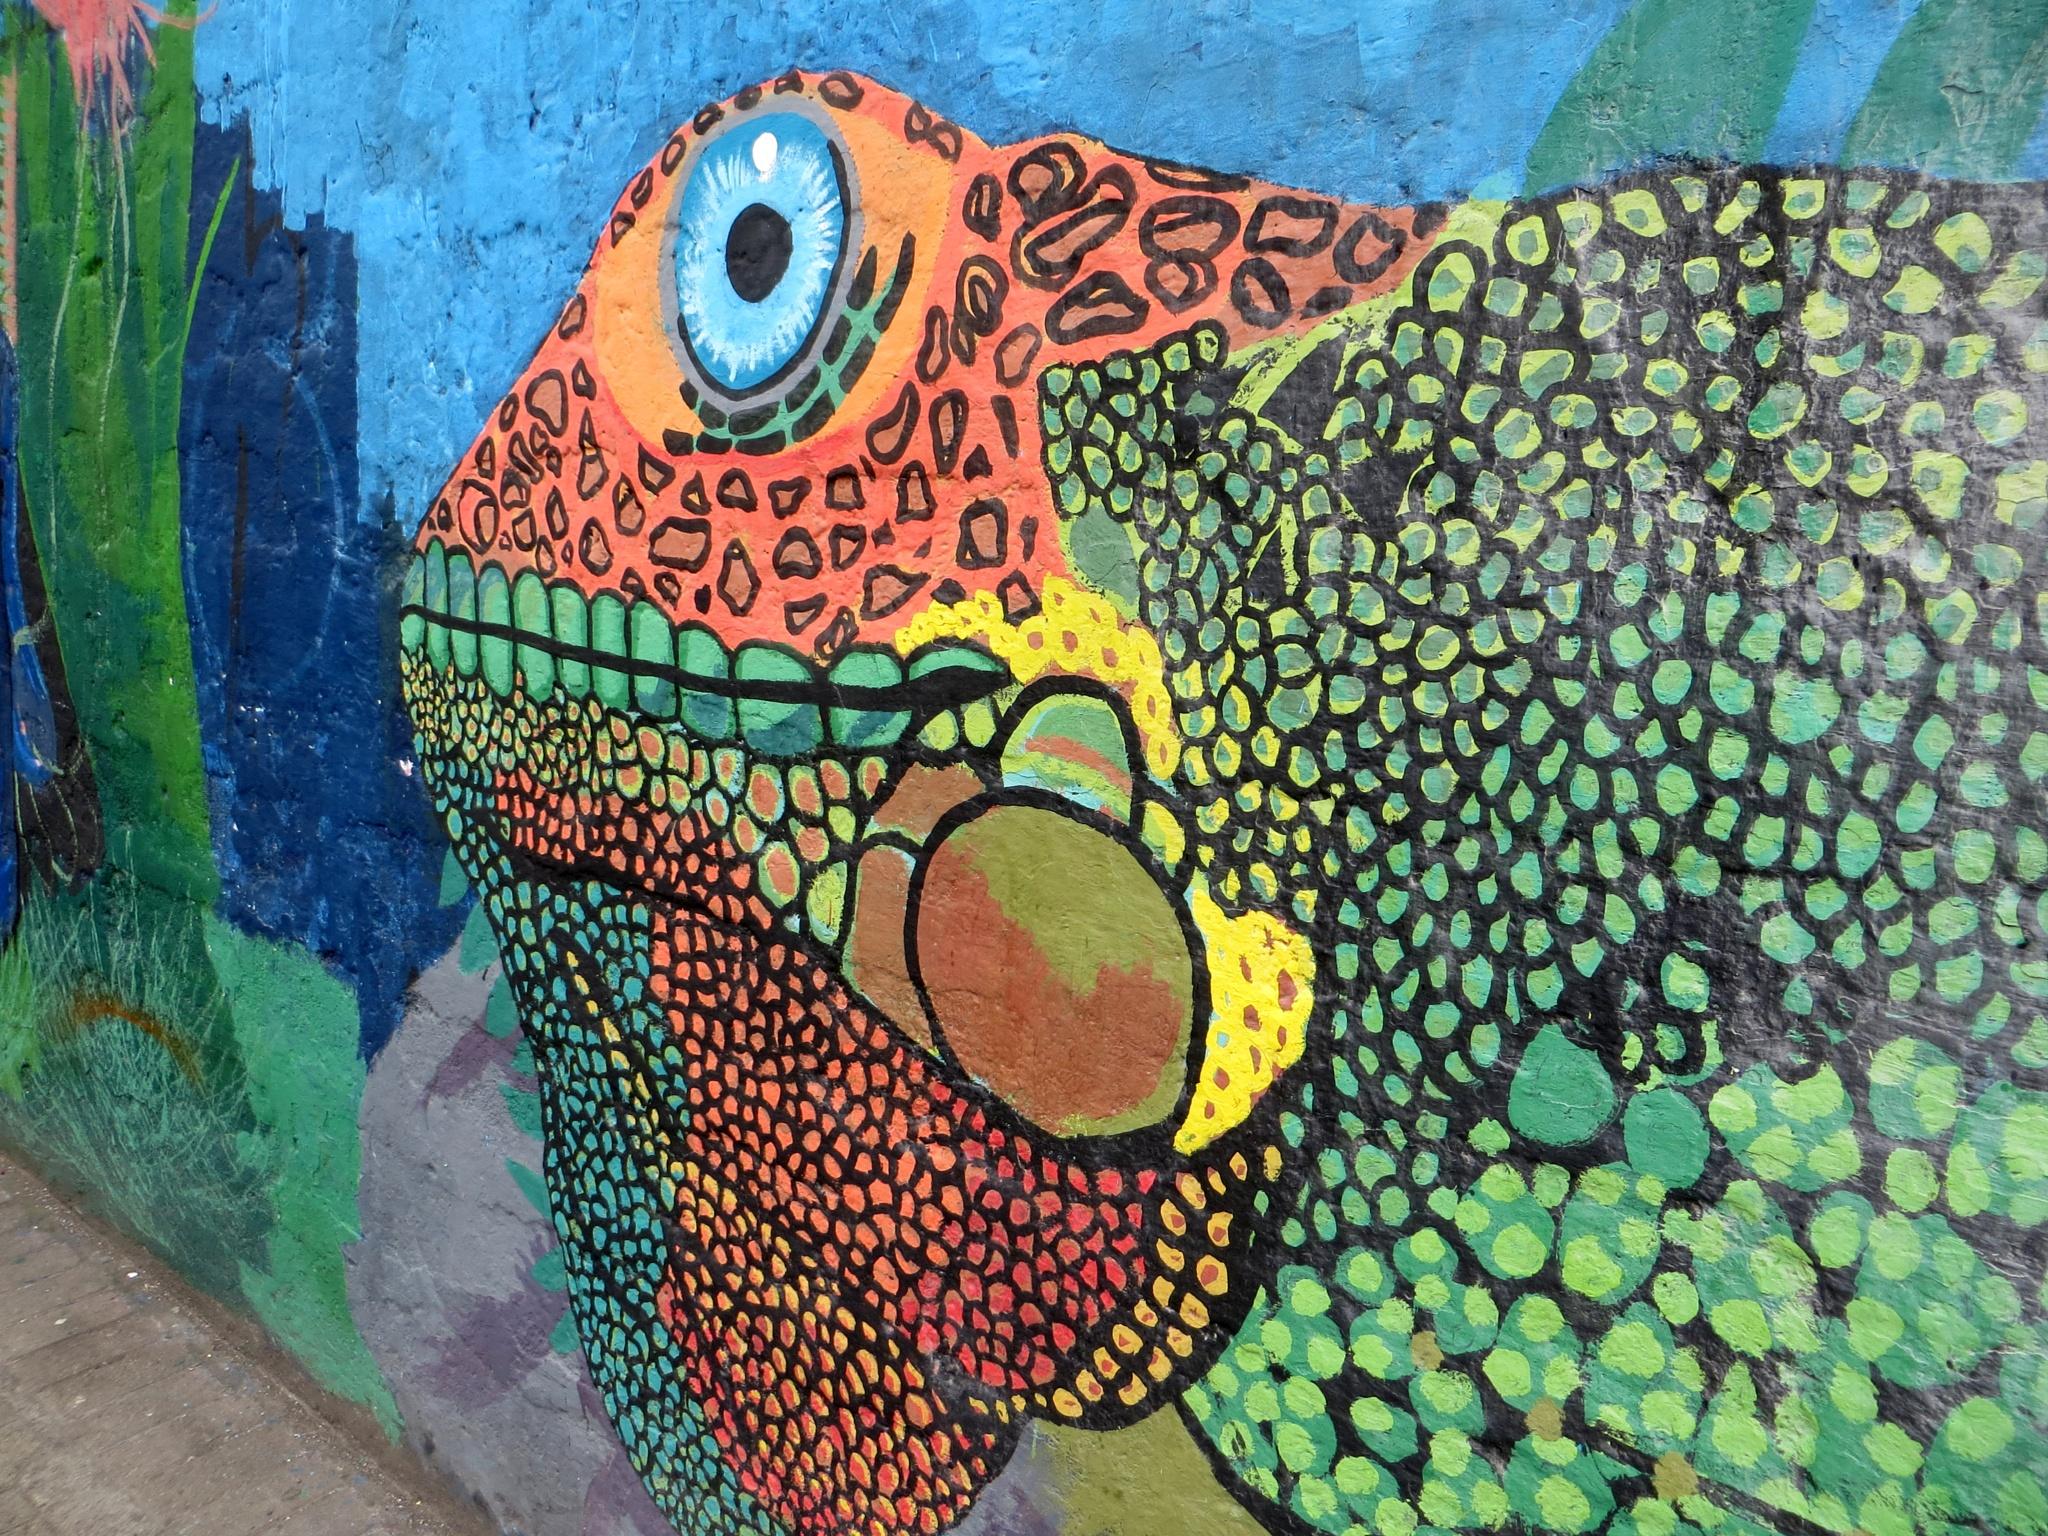 Ecuadorian Graffiti, Banos by #LuvToTravelWorld